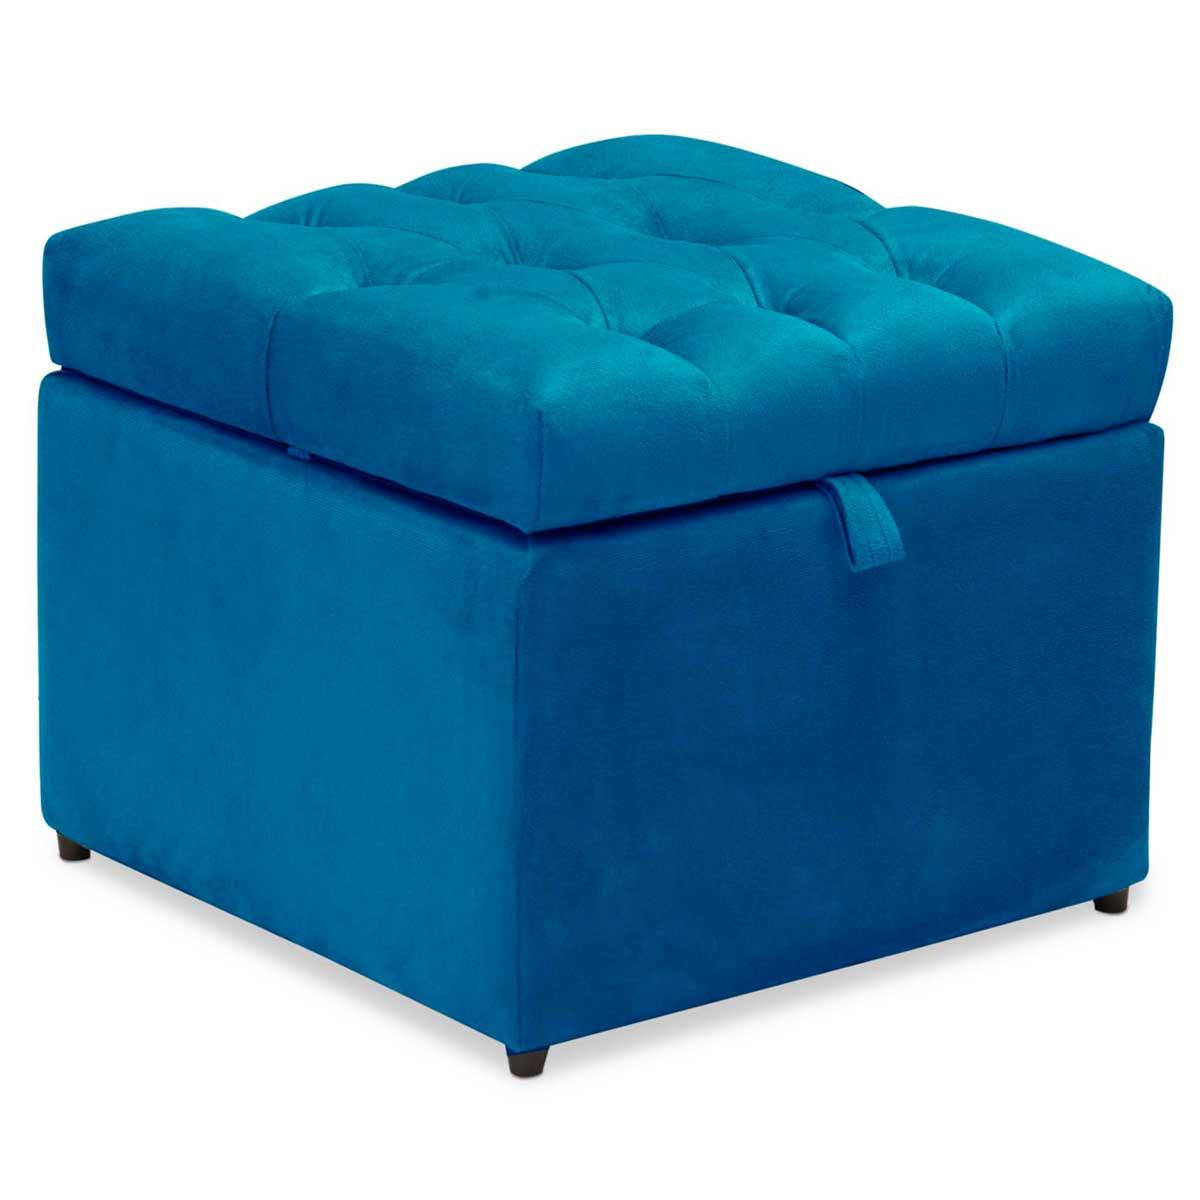 Kit 2 Puff Baú Mali Animale Azul Arte das Cabeceiras